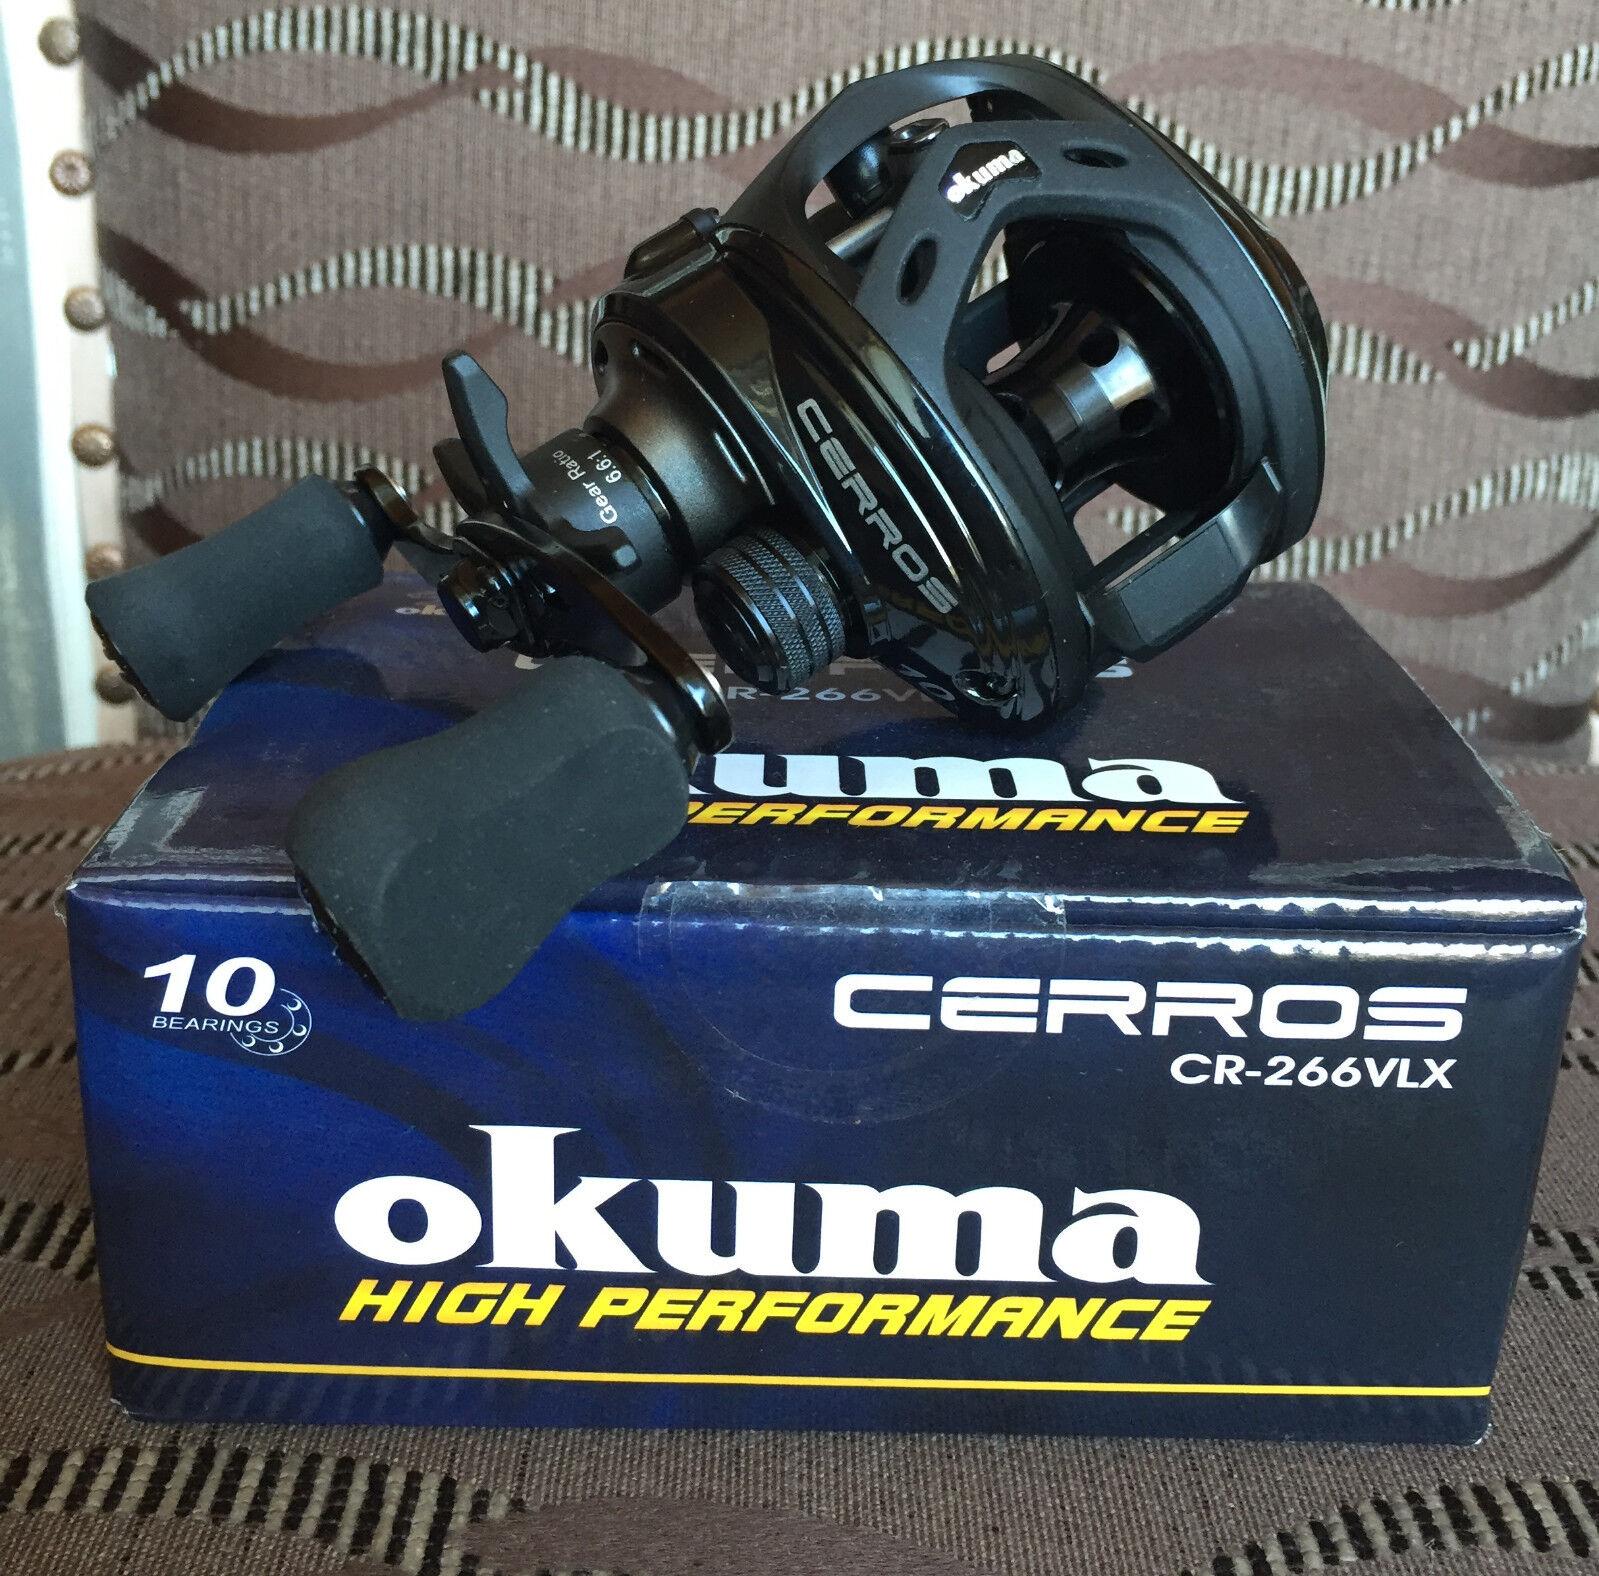 Okuma Cerros Baitcaster CR-266VLX Linkshand Baitcaster Cerros Multirolle zum Spinnfischen e2c696